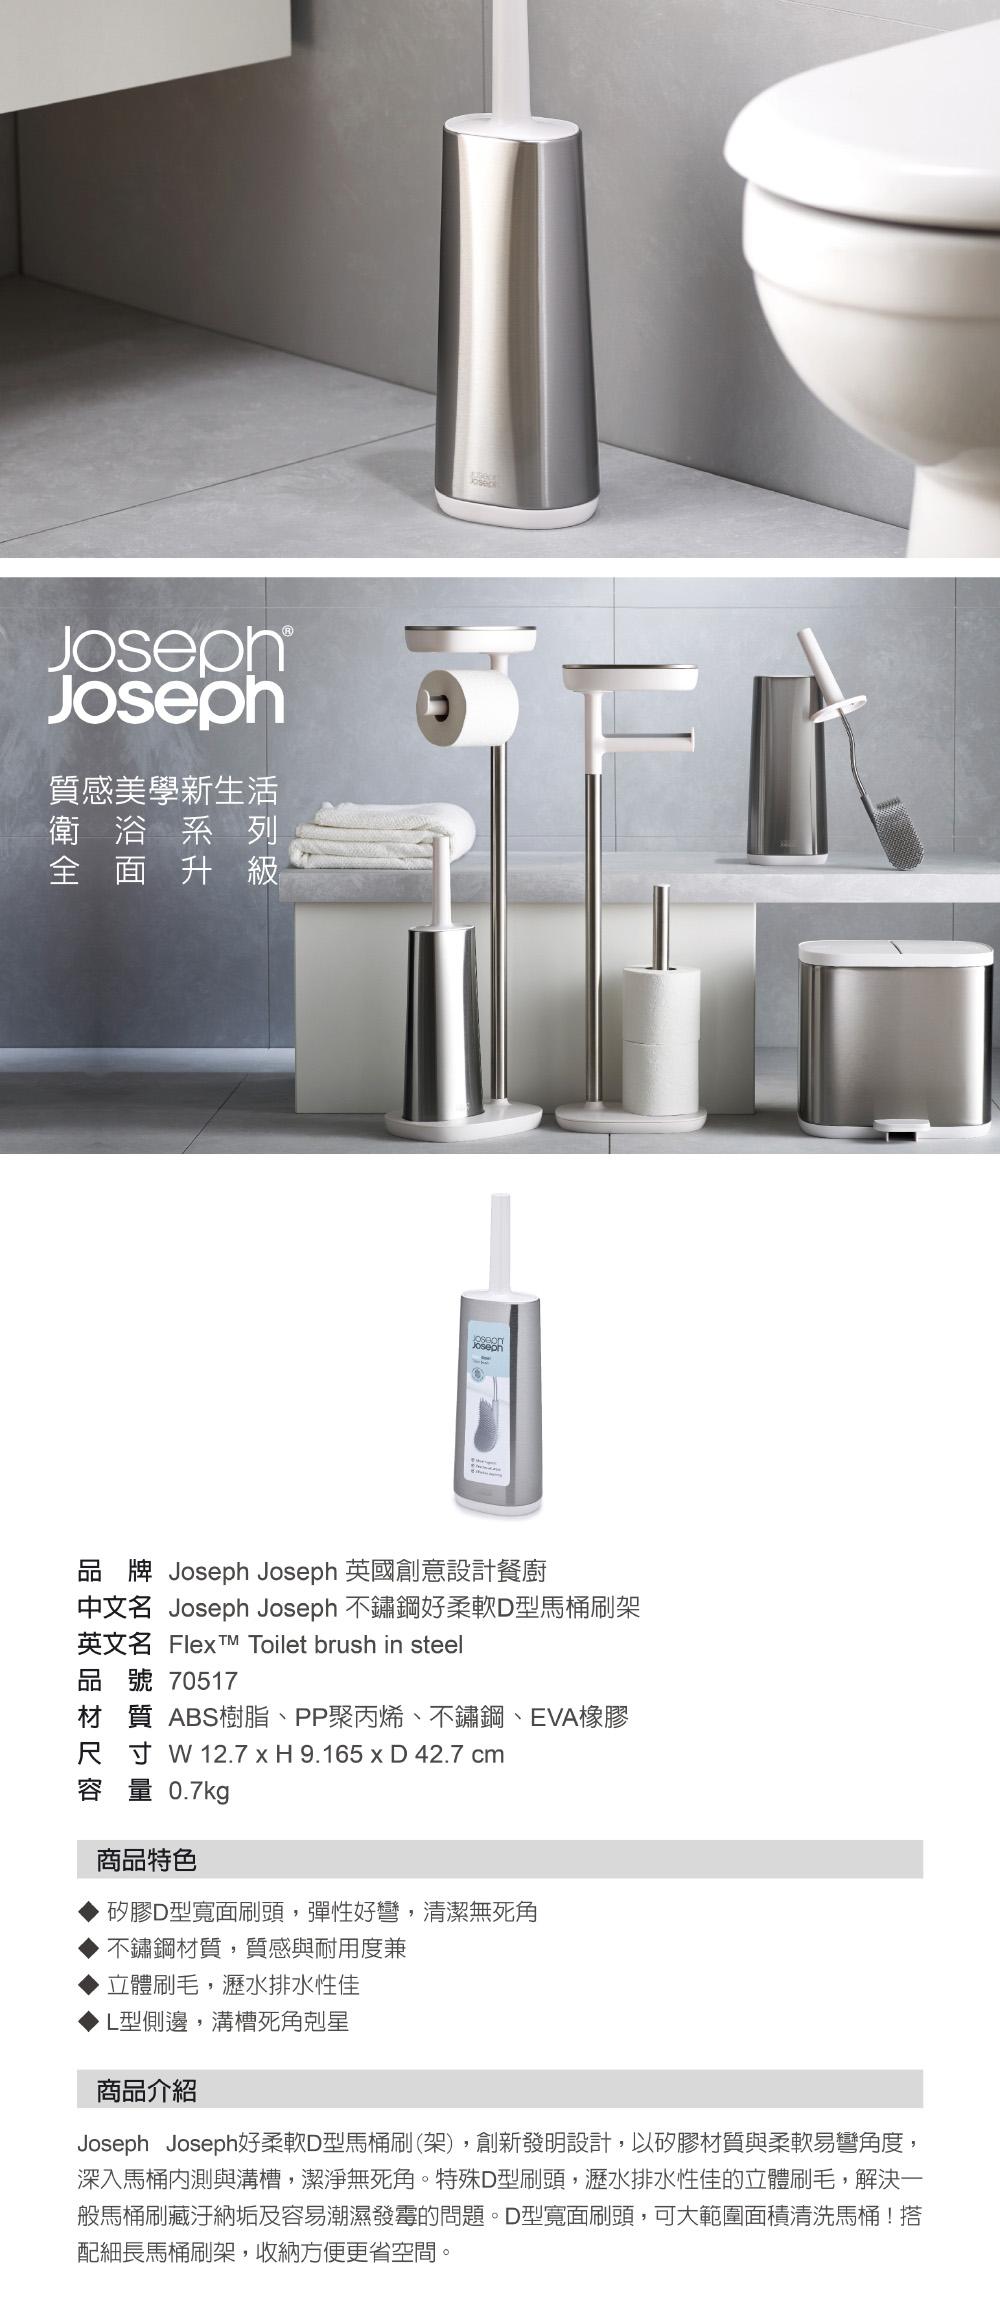 Joseph Joseph 不鏽鋼好柔軟D型馬桶刷架 1